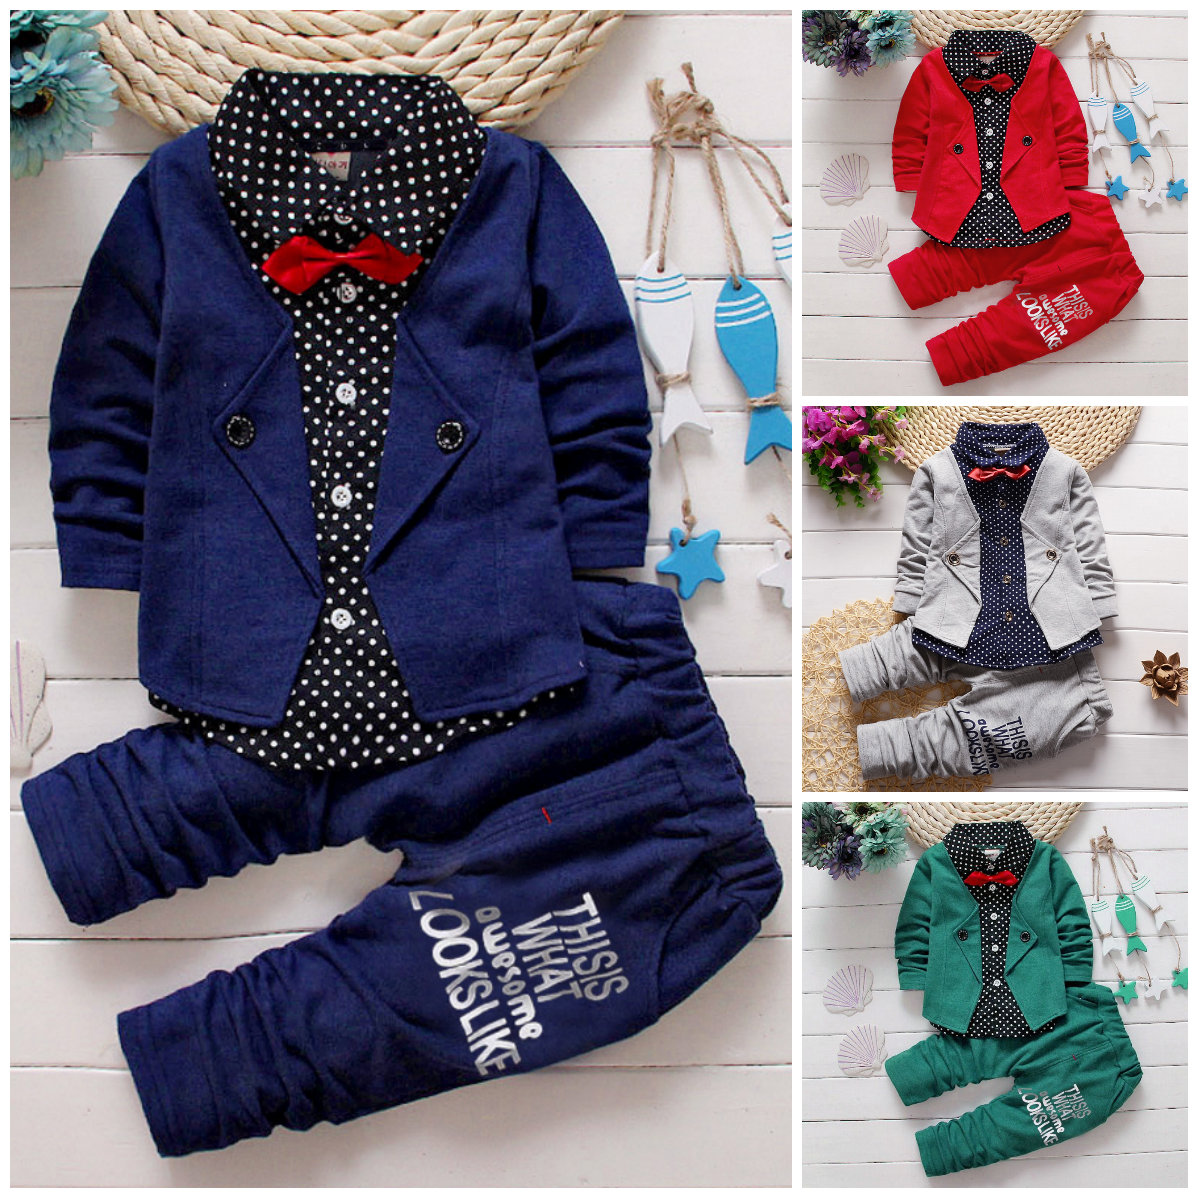 81f6f7f567a Details about 2pcs Kids Baby clothes baby boys clothes cotton top+pants  suit outfits gentleman